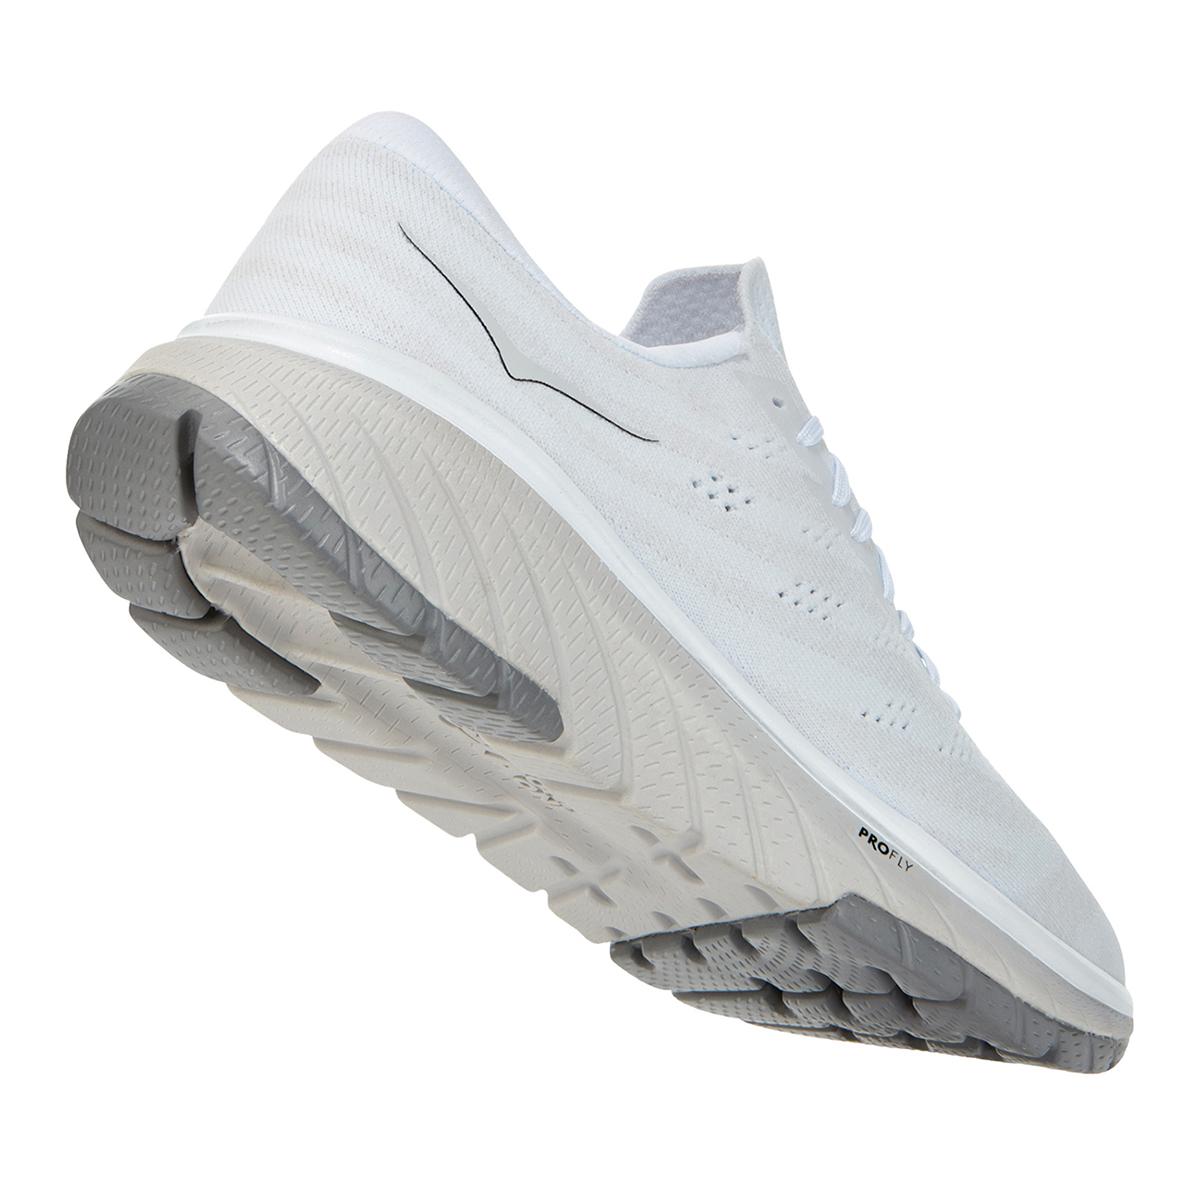 Men's Hoka One One Cavu 3 Running Shoe - Color: White/Nimbus Cloud - Size: 7 - Width: Regular, White/Nimbus Cloud, large, image 6